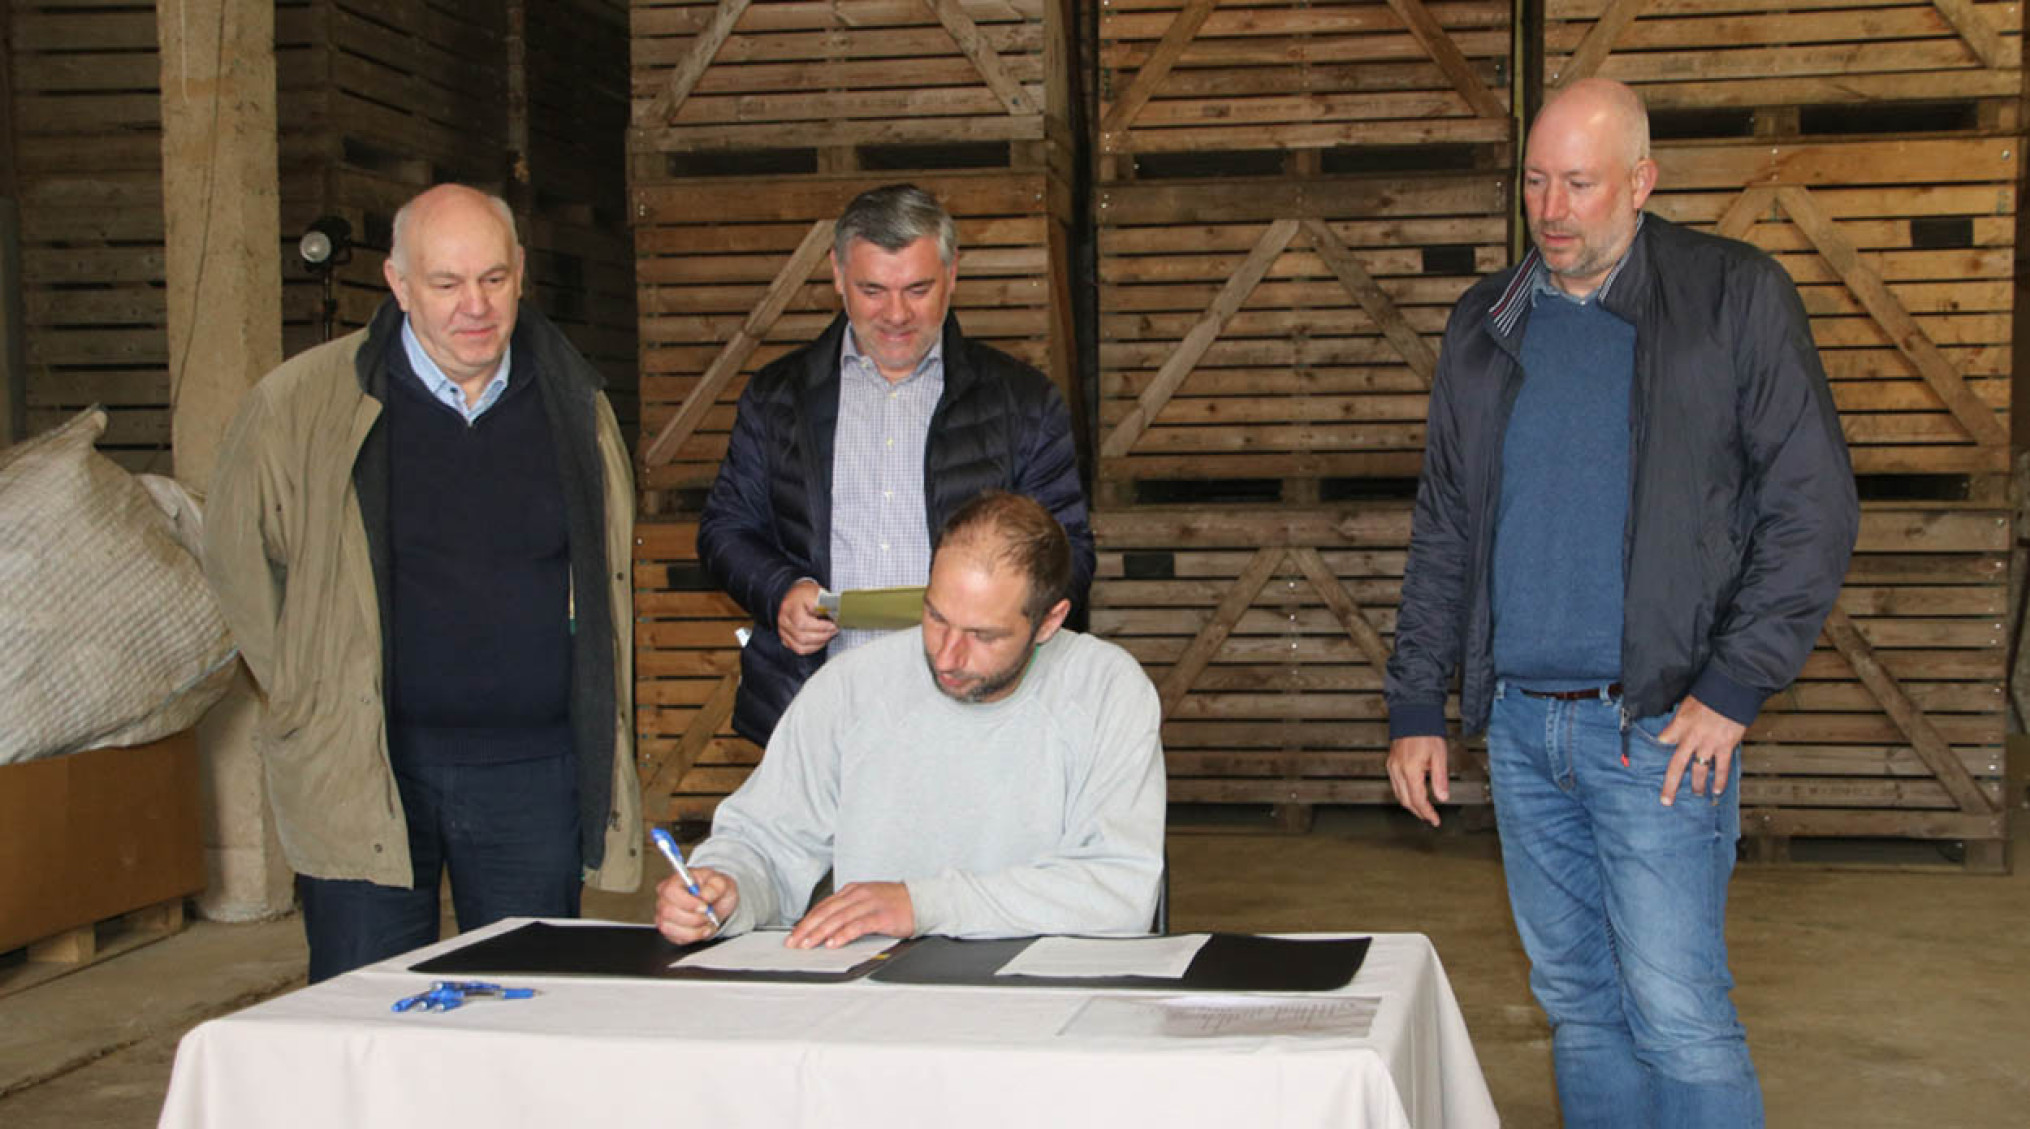 ondertekening keten biobaktarwe Colruyt